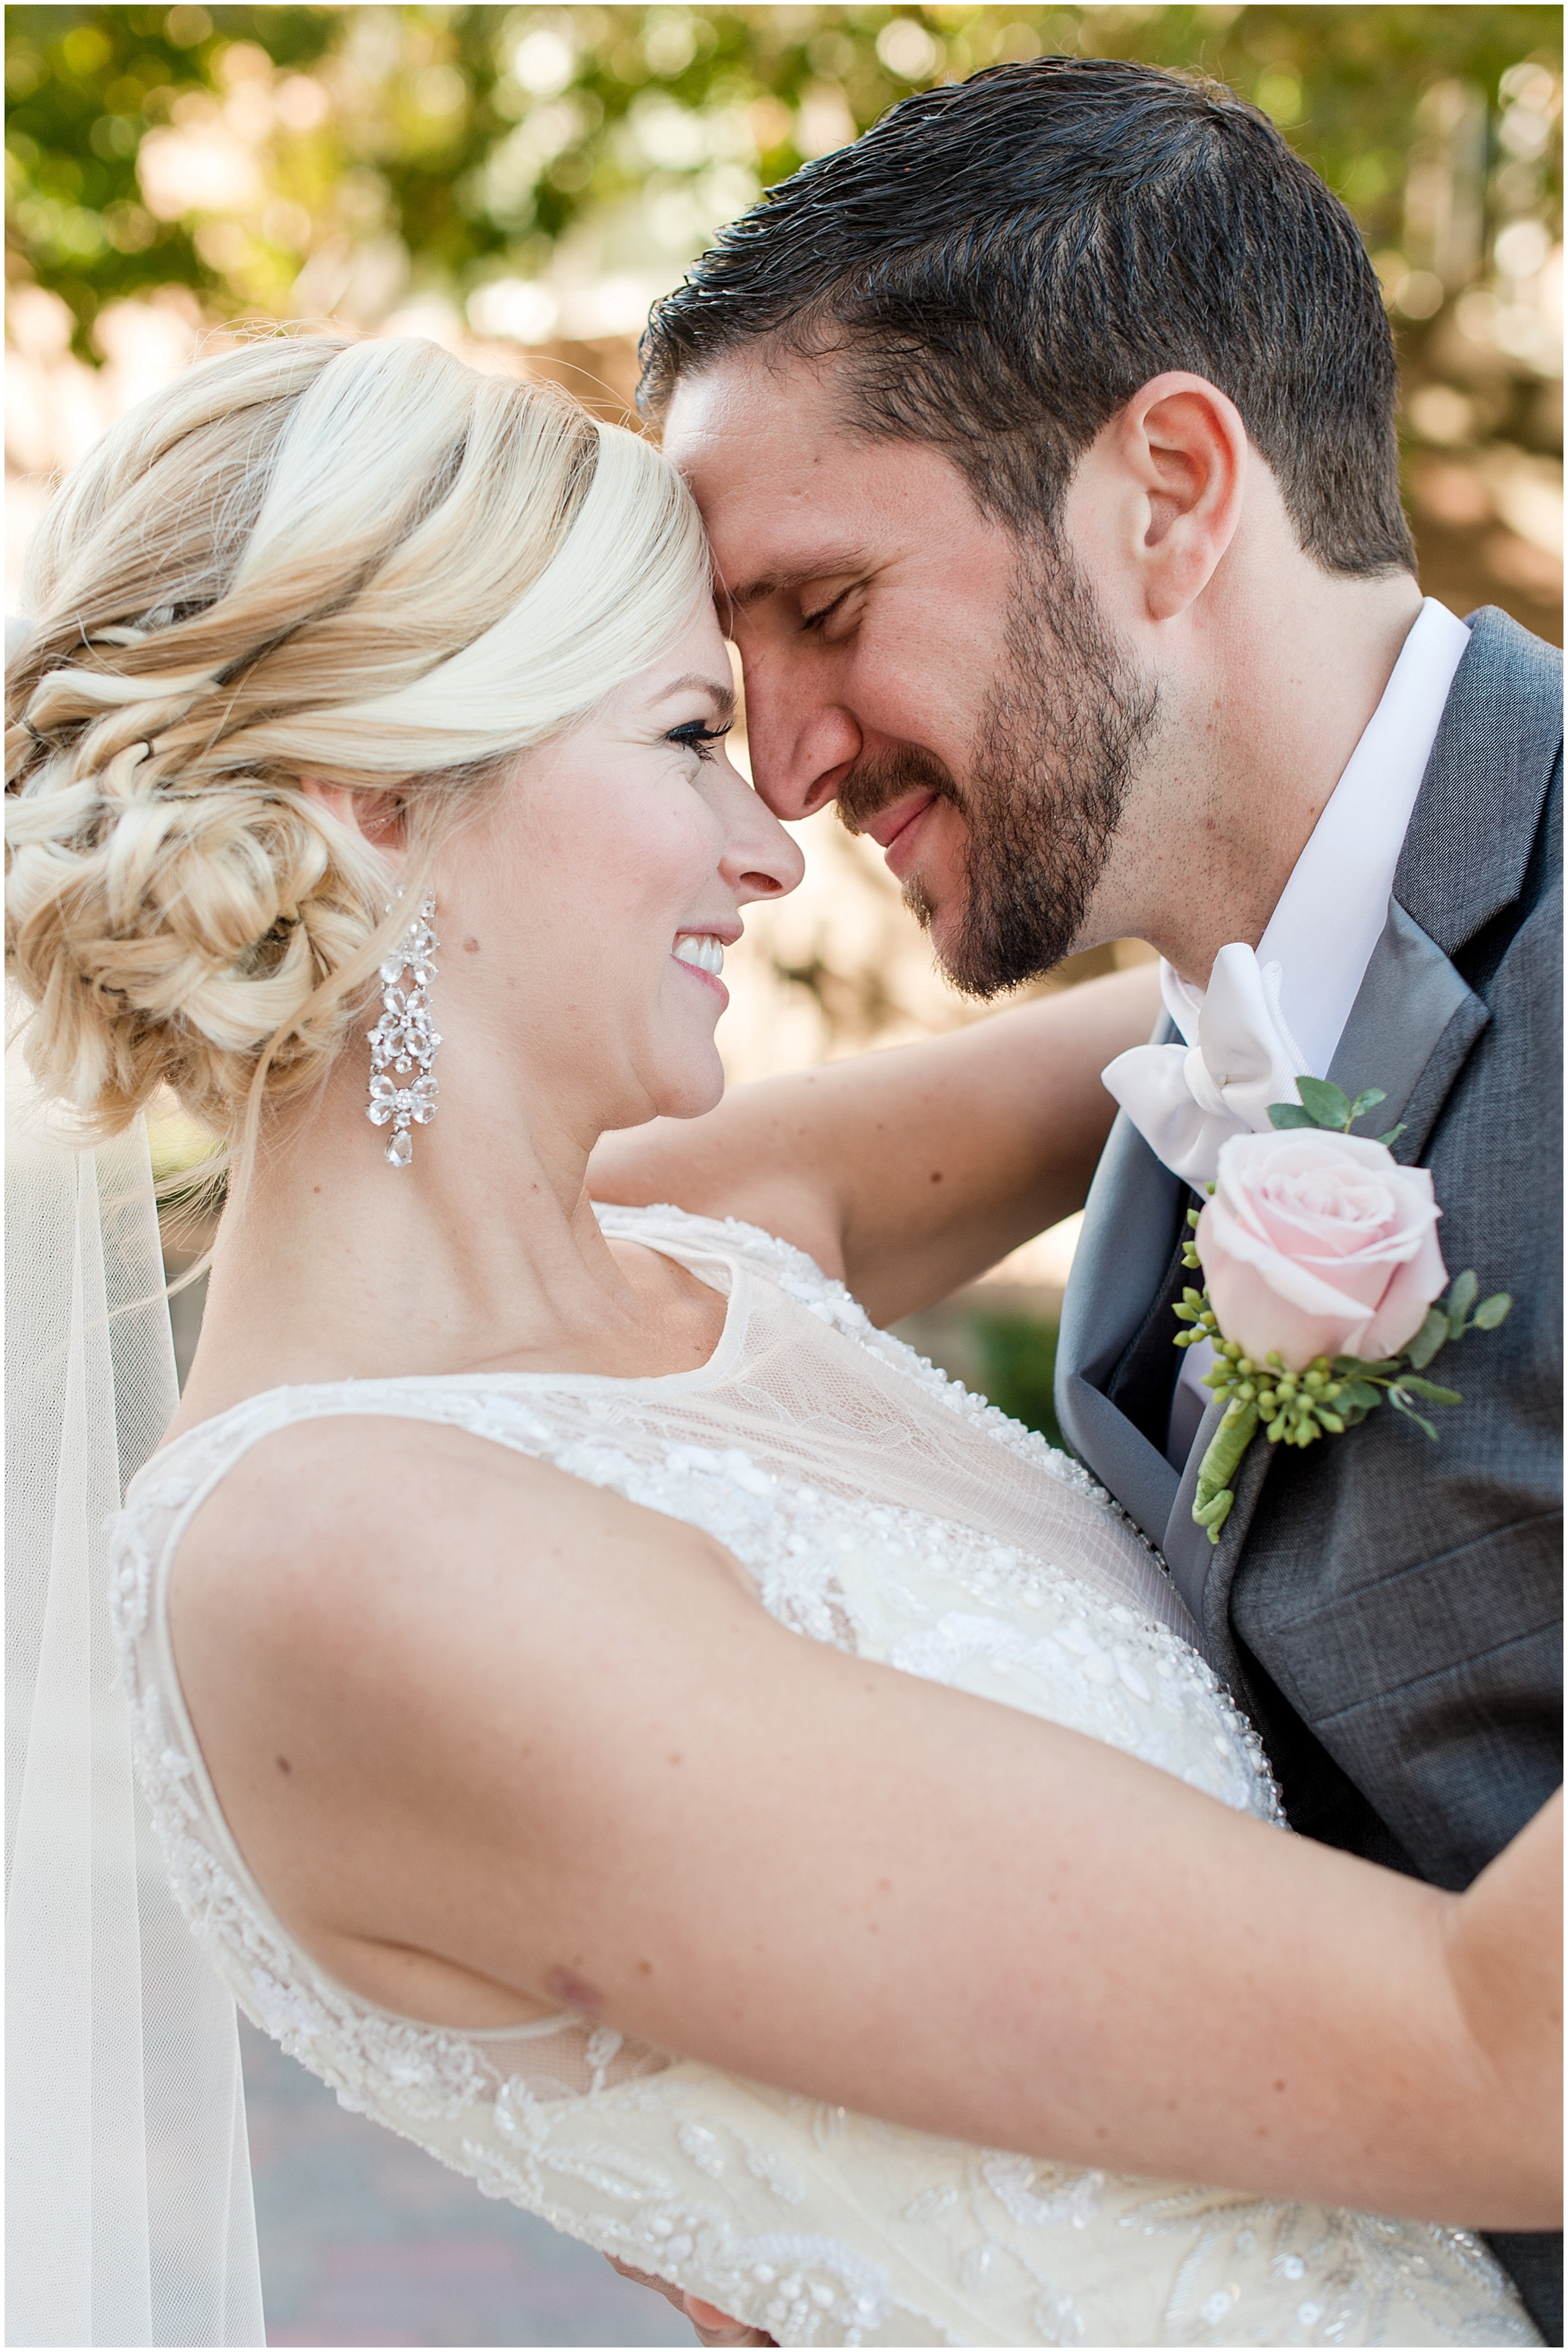 Hannah Leigh Photography Tabrizis Baltimore Wedding_2224.jpg